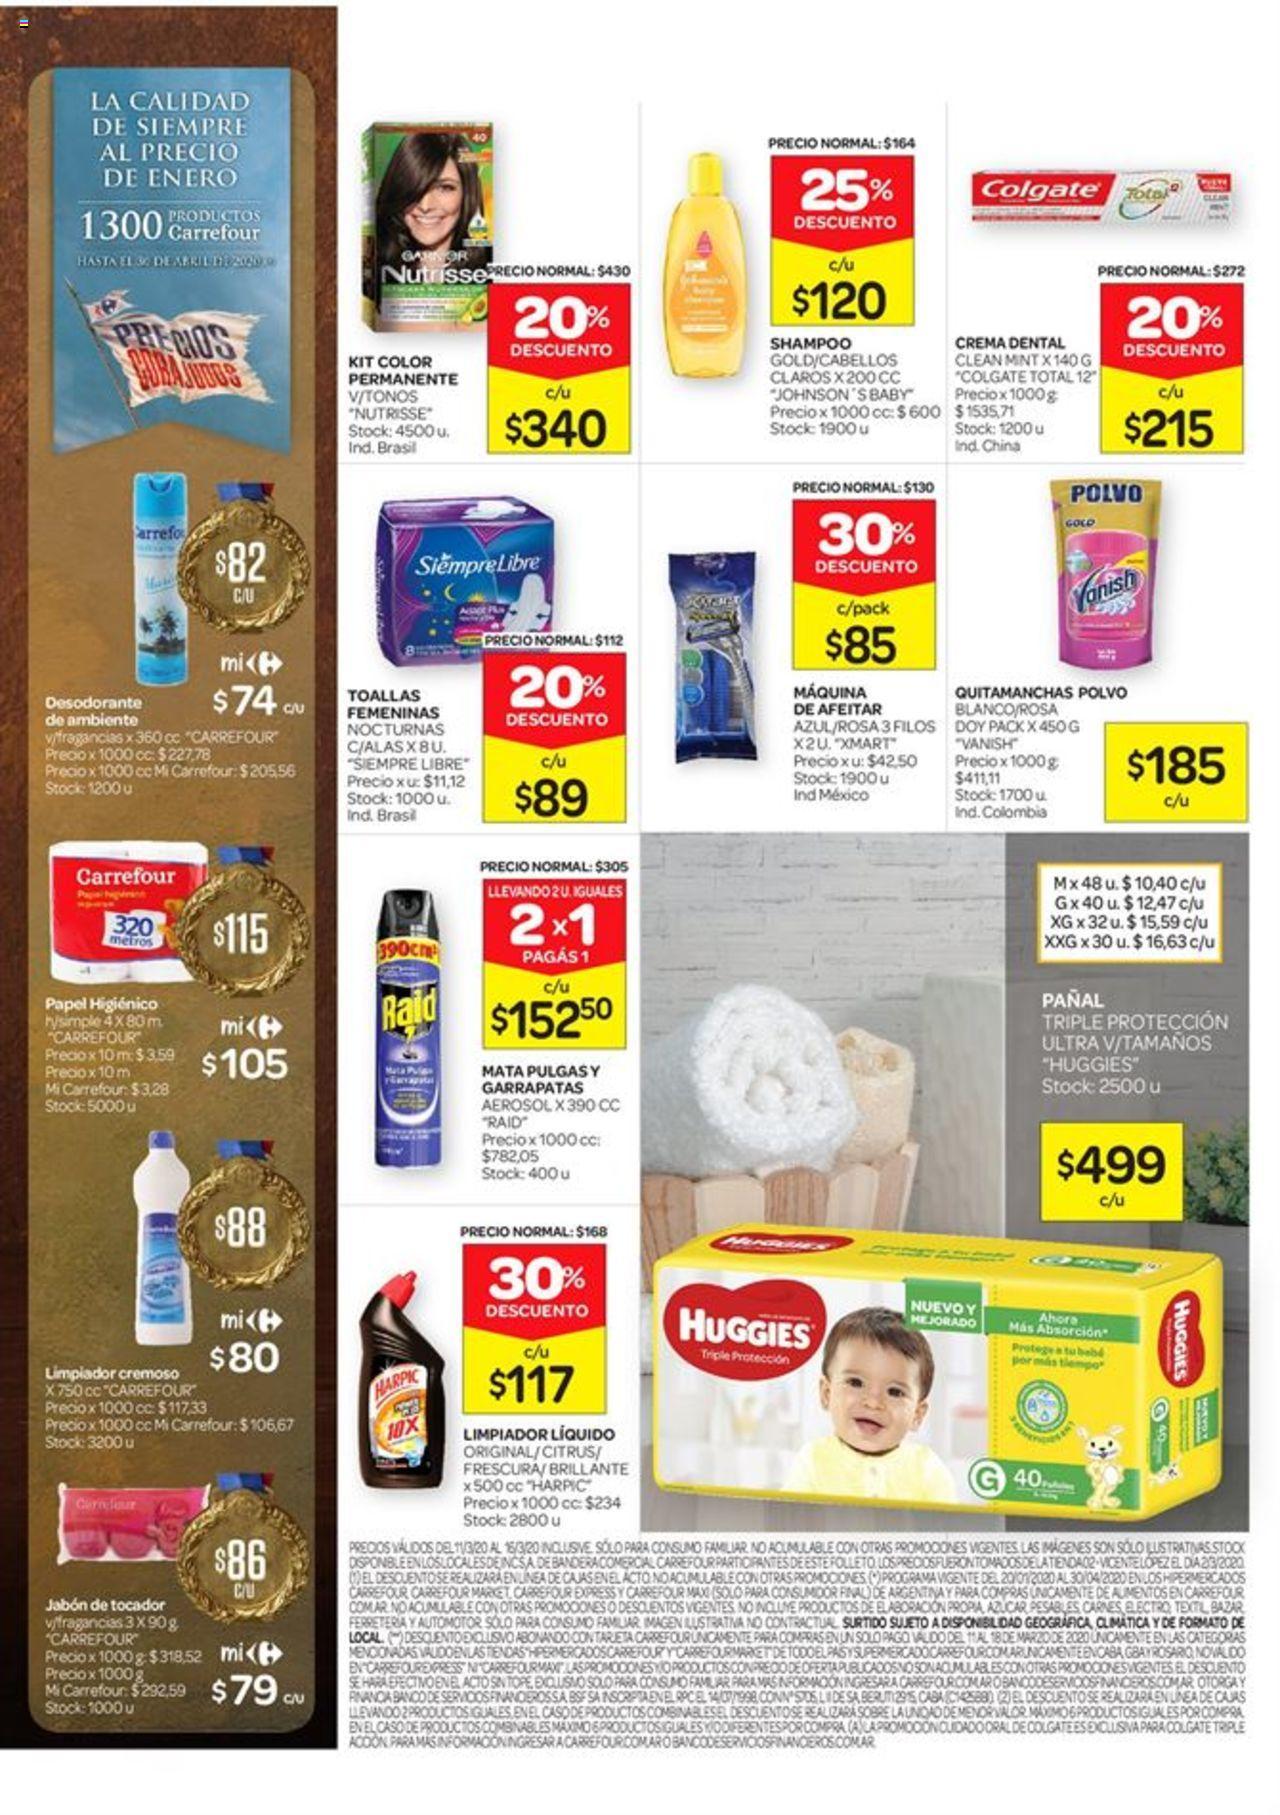 Carrefour - Catálogo válido desde el 11/03/2020 número de página 1 | Página: 6